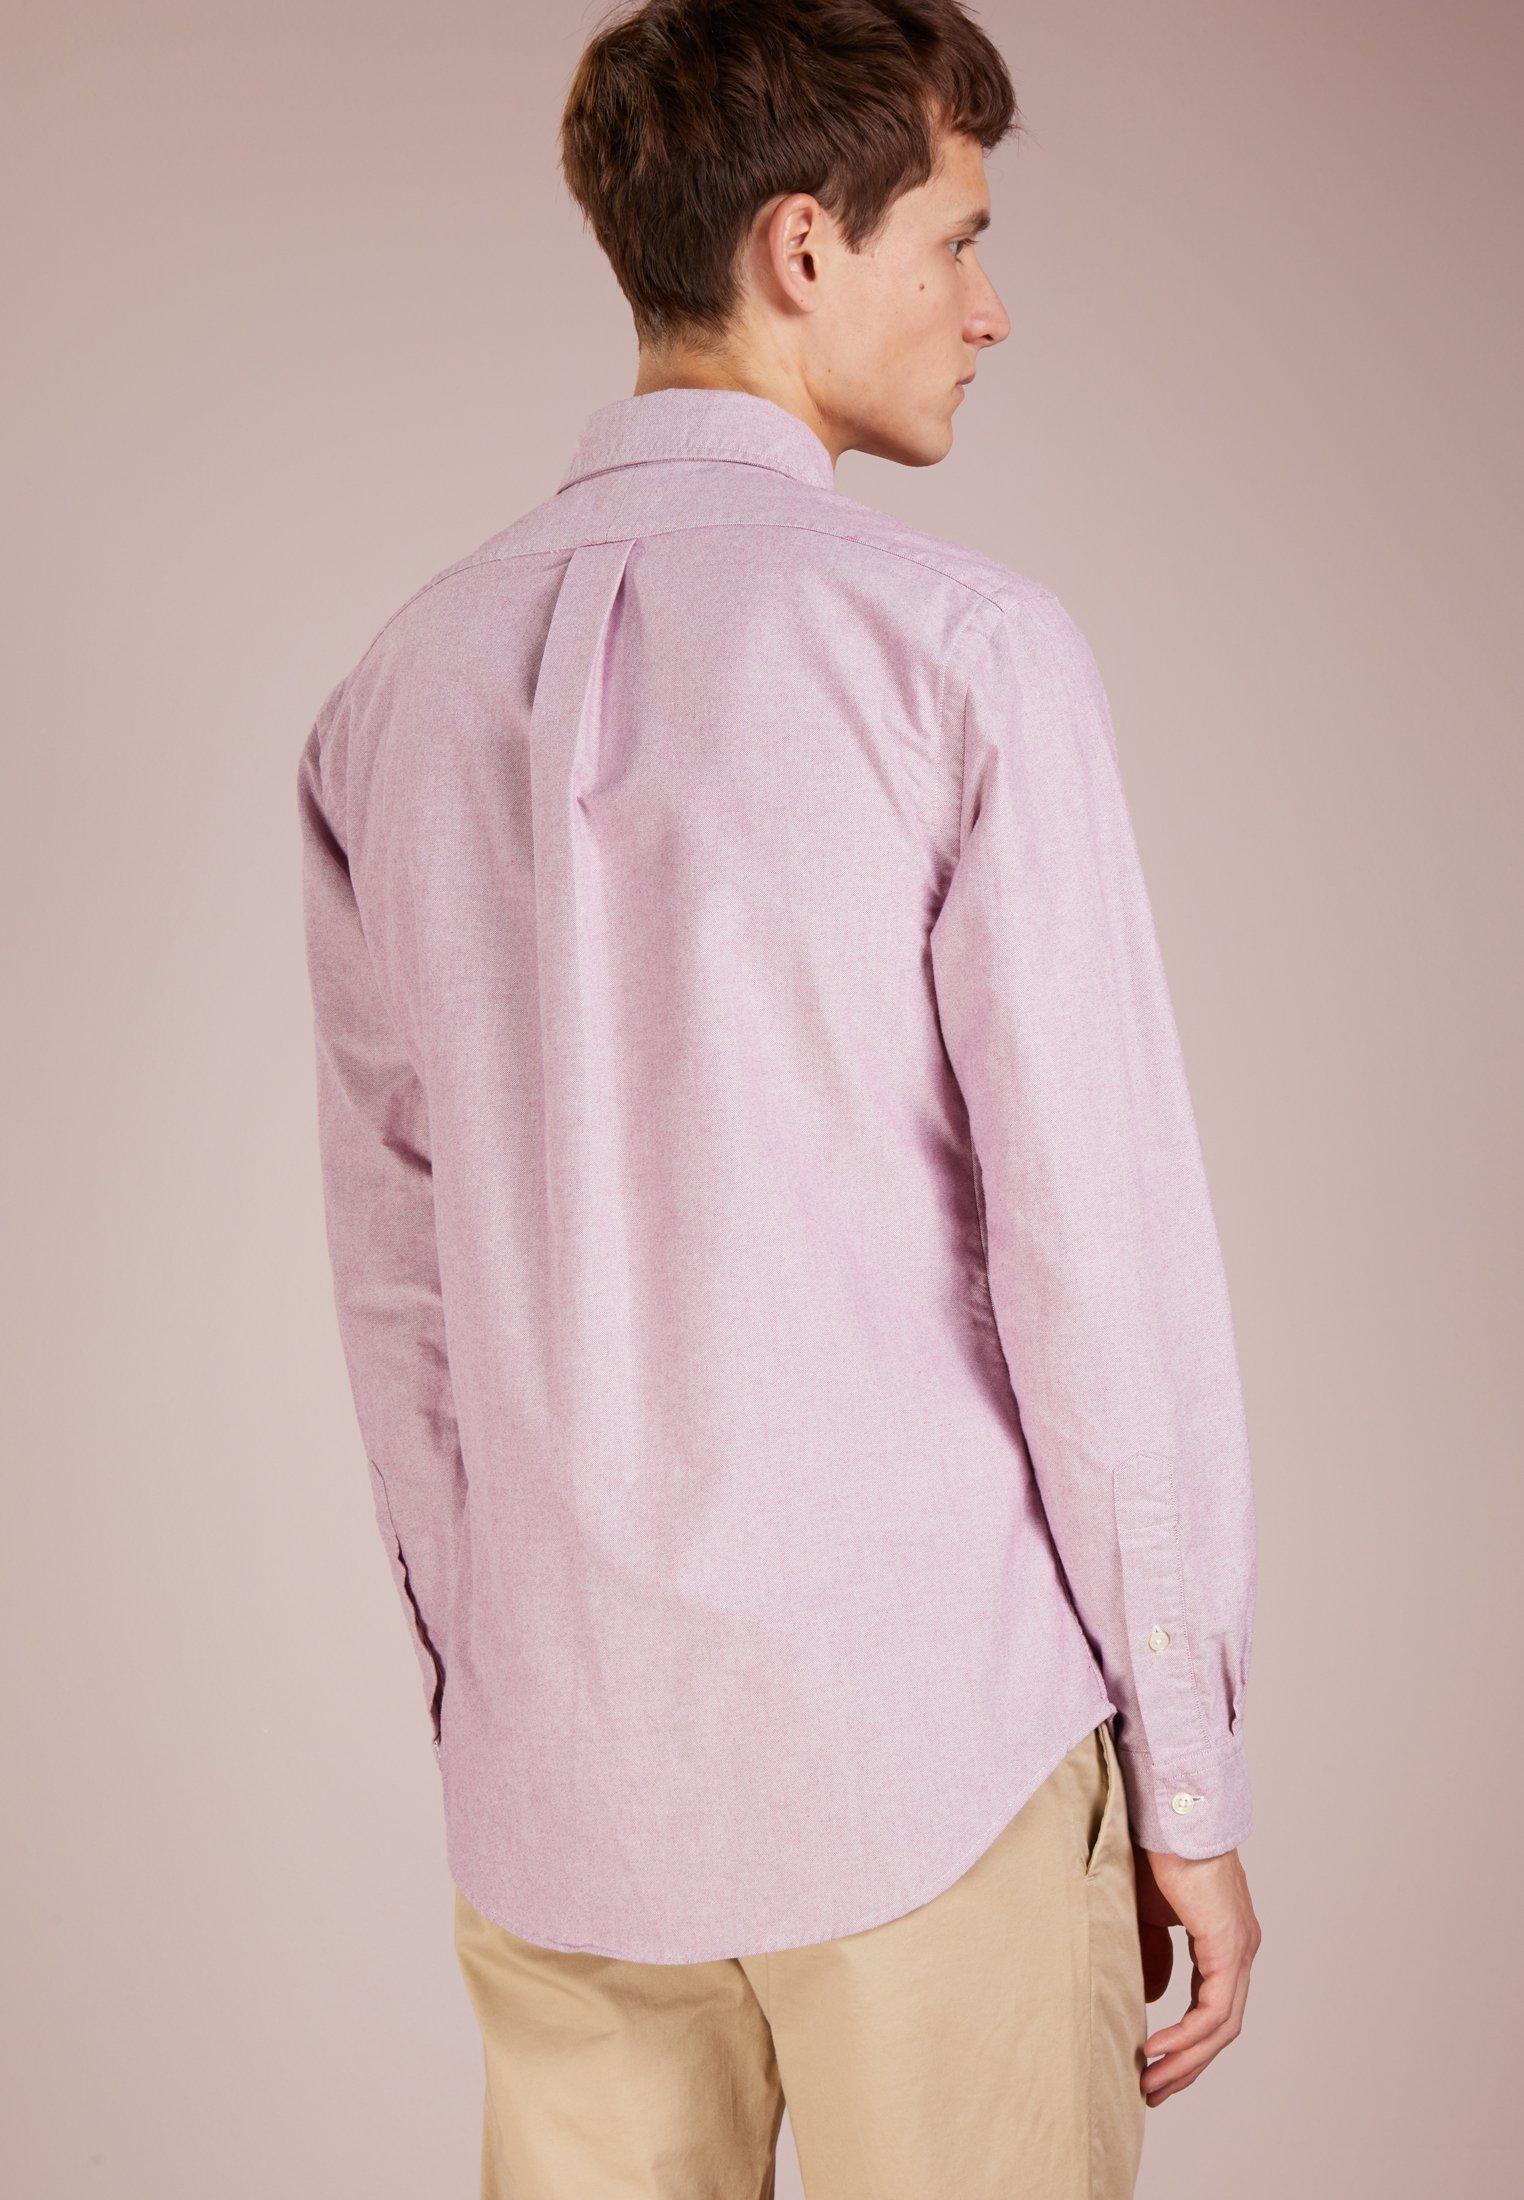 Polo Ralph Lauren Oxford Slim Fit - Skjorta Crimson/white